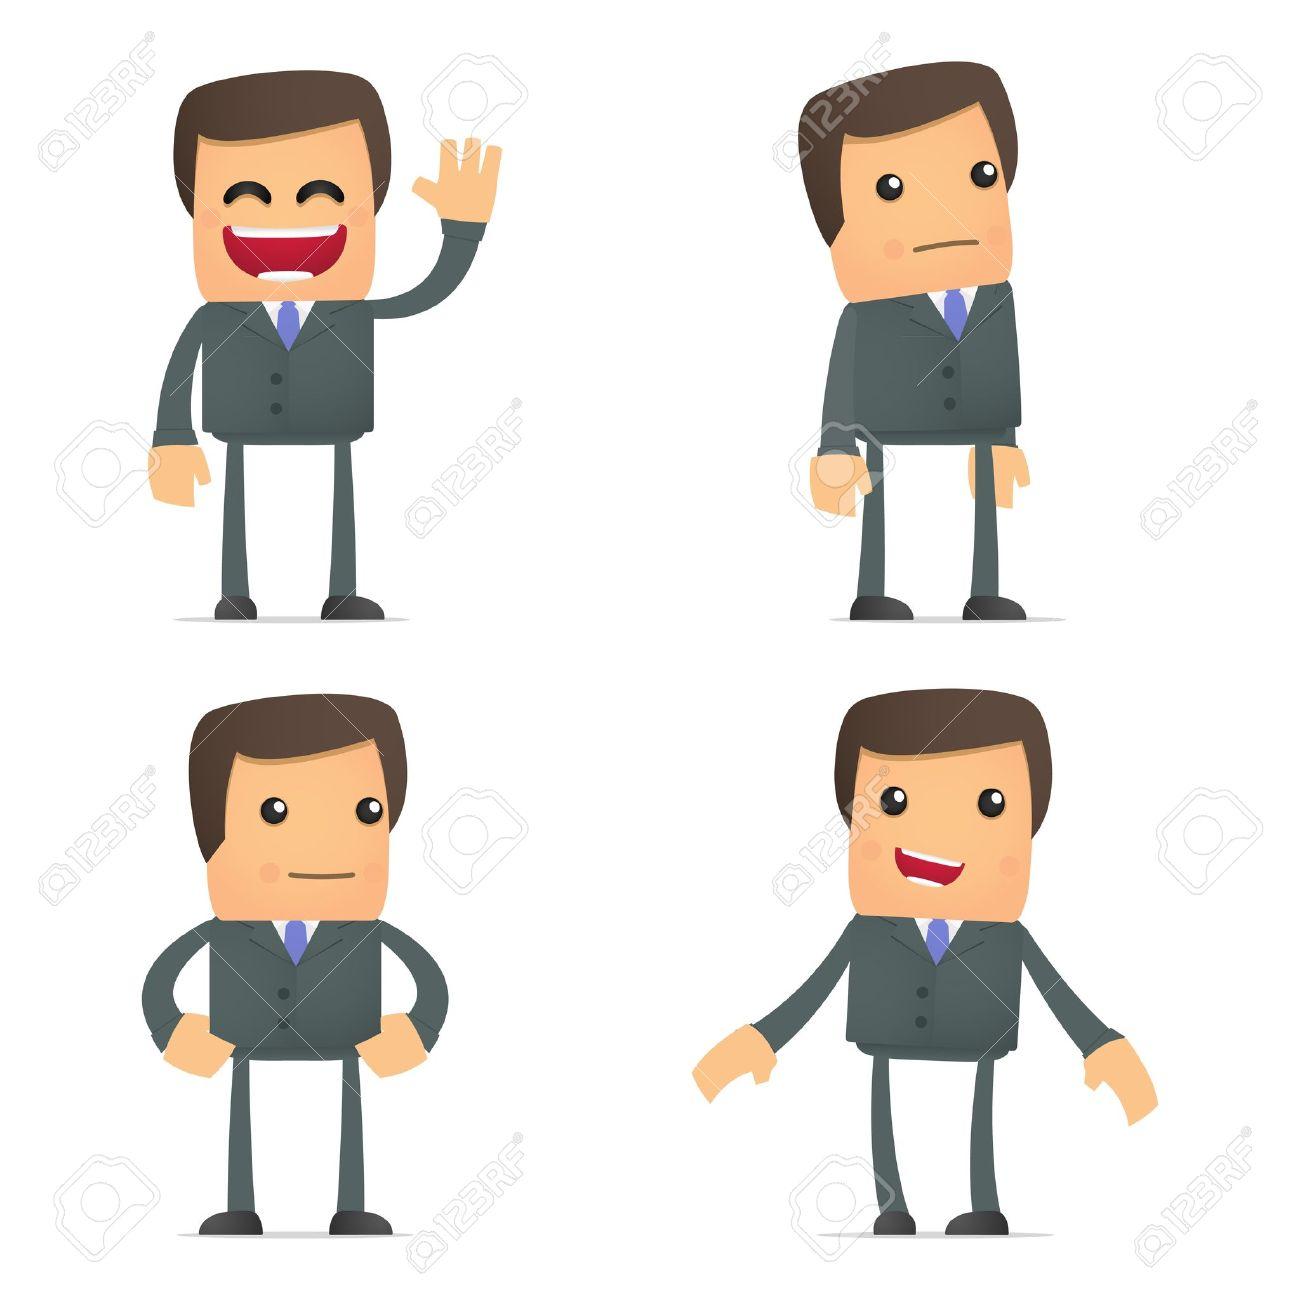 Business team cartoon characters cartoon vector cartoondealer com - Cartoon Businessman Set Of Funny Cartoon Businessman